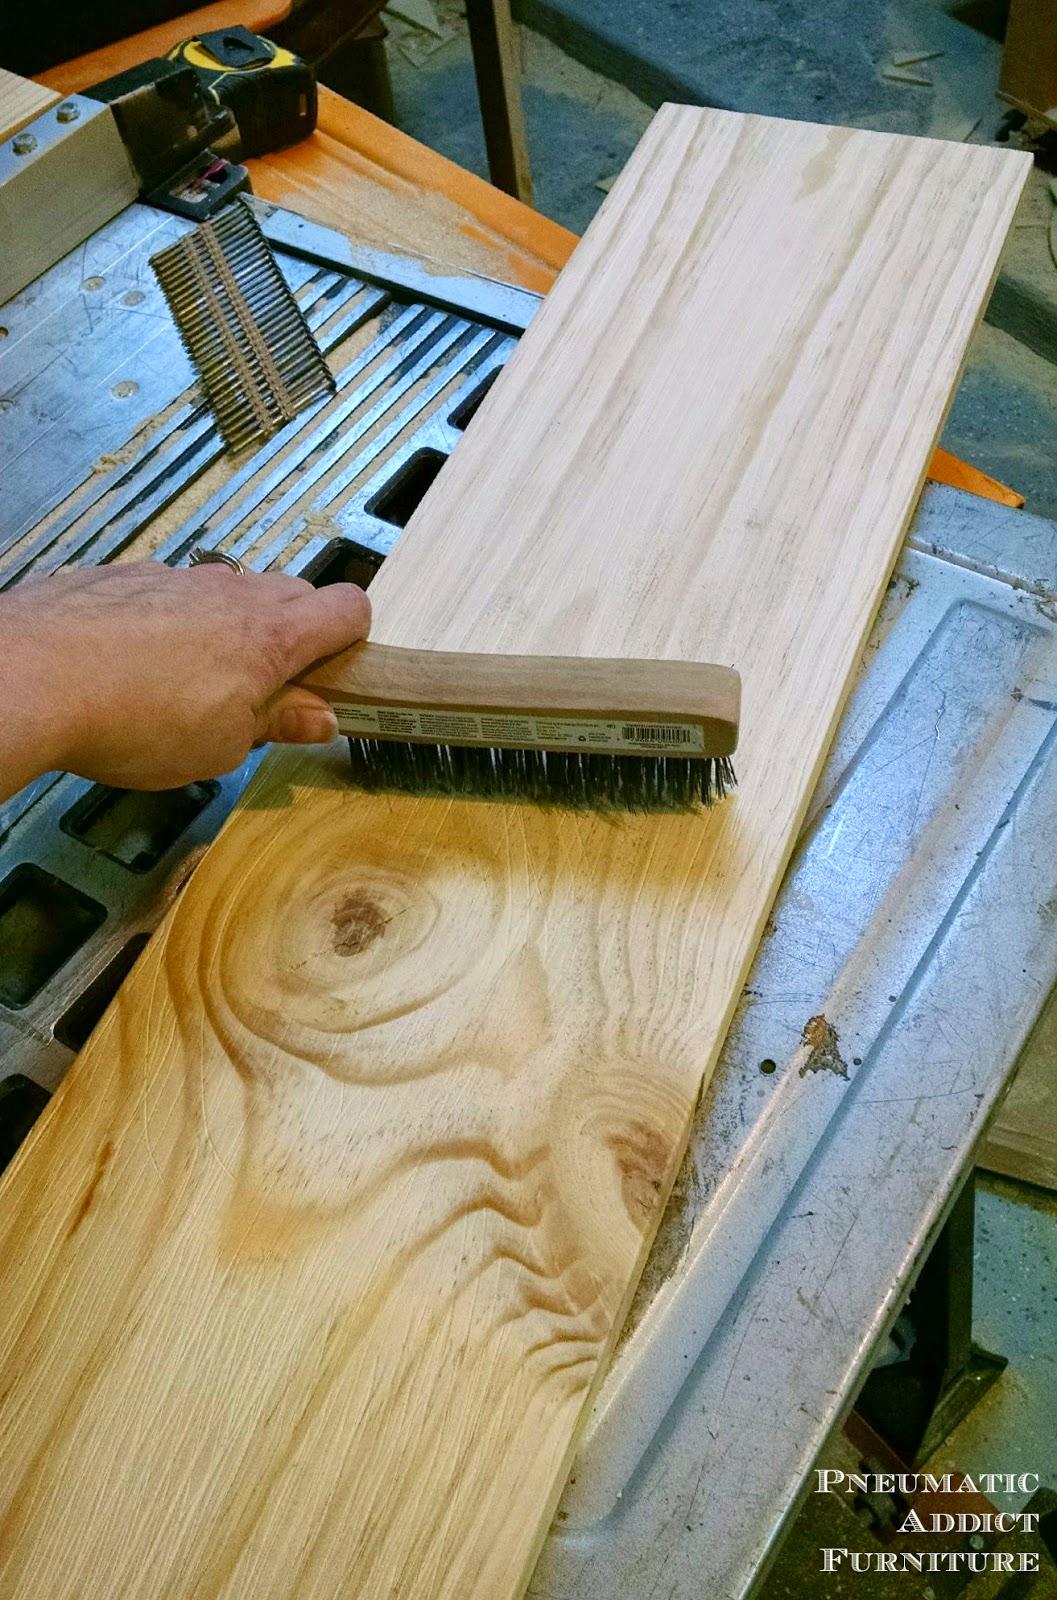 Pneumatic Addict : How to Get a Textured, Raised Grain on Wood Raising Grain